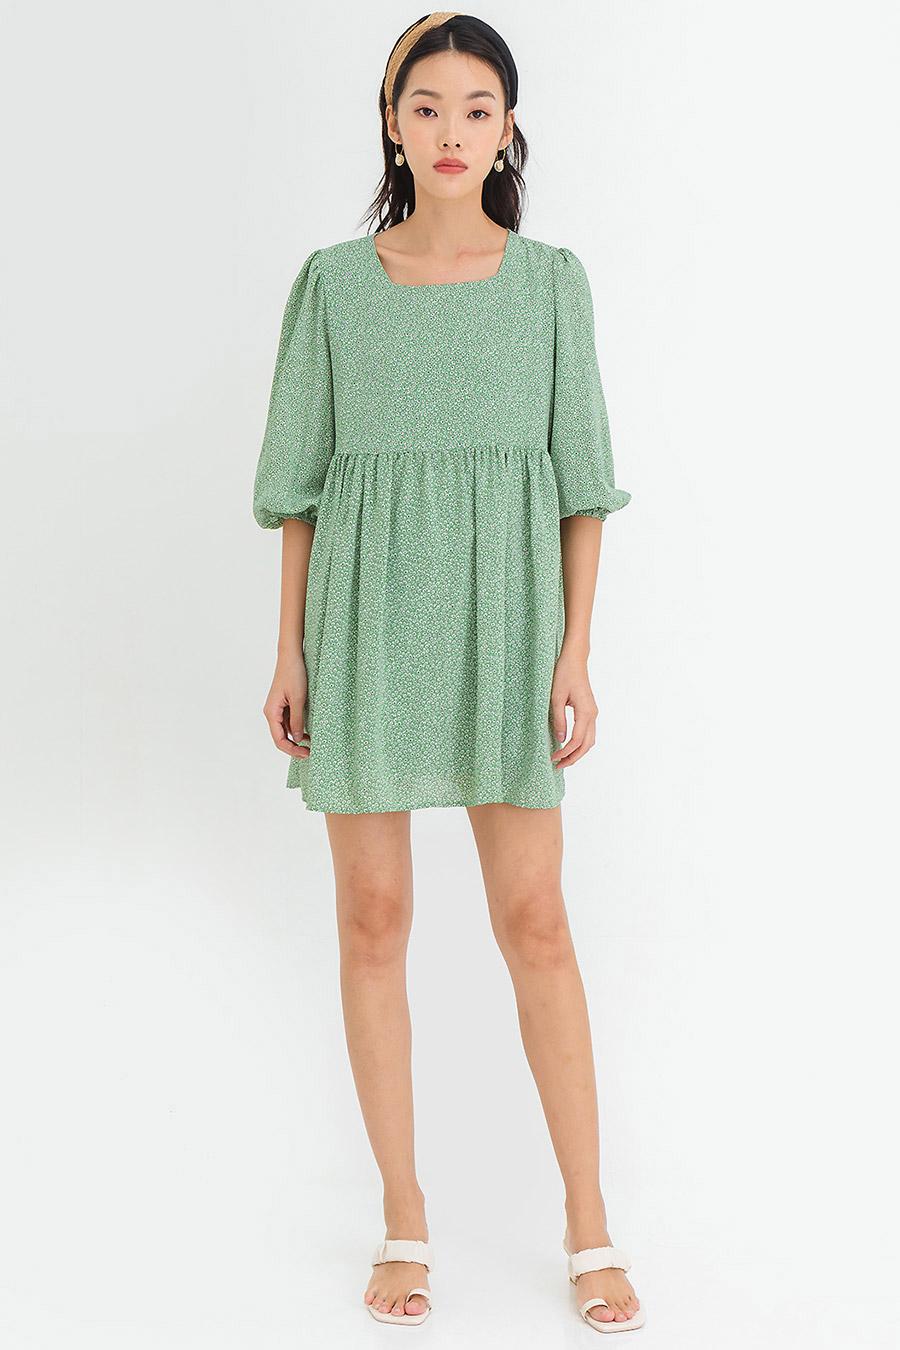 FABIAN DRESS - PALM FLEUR